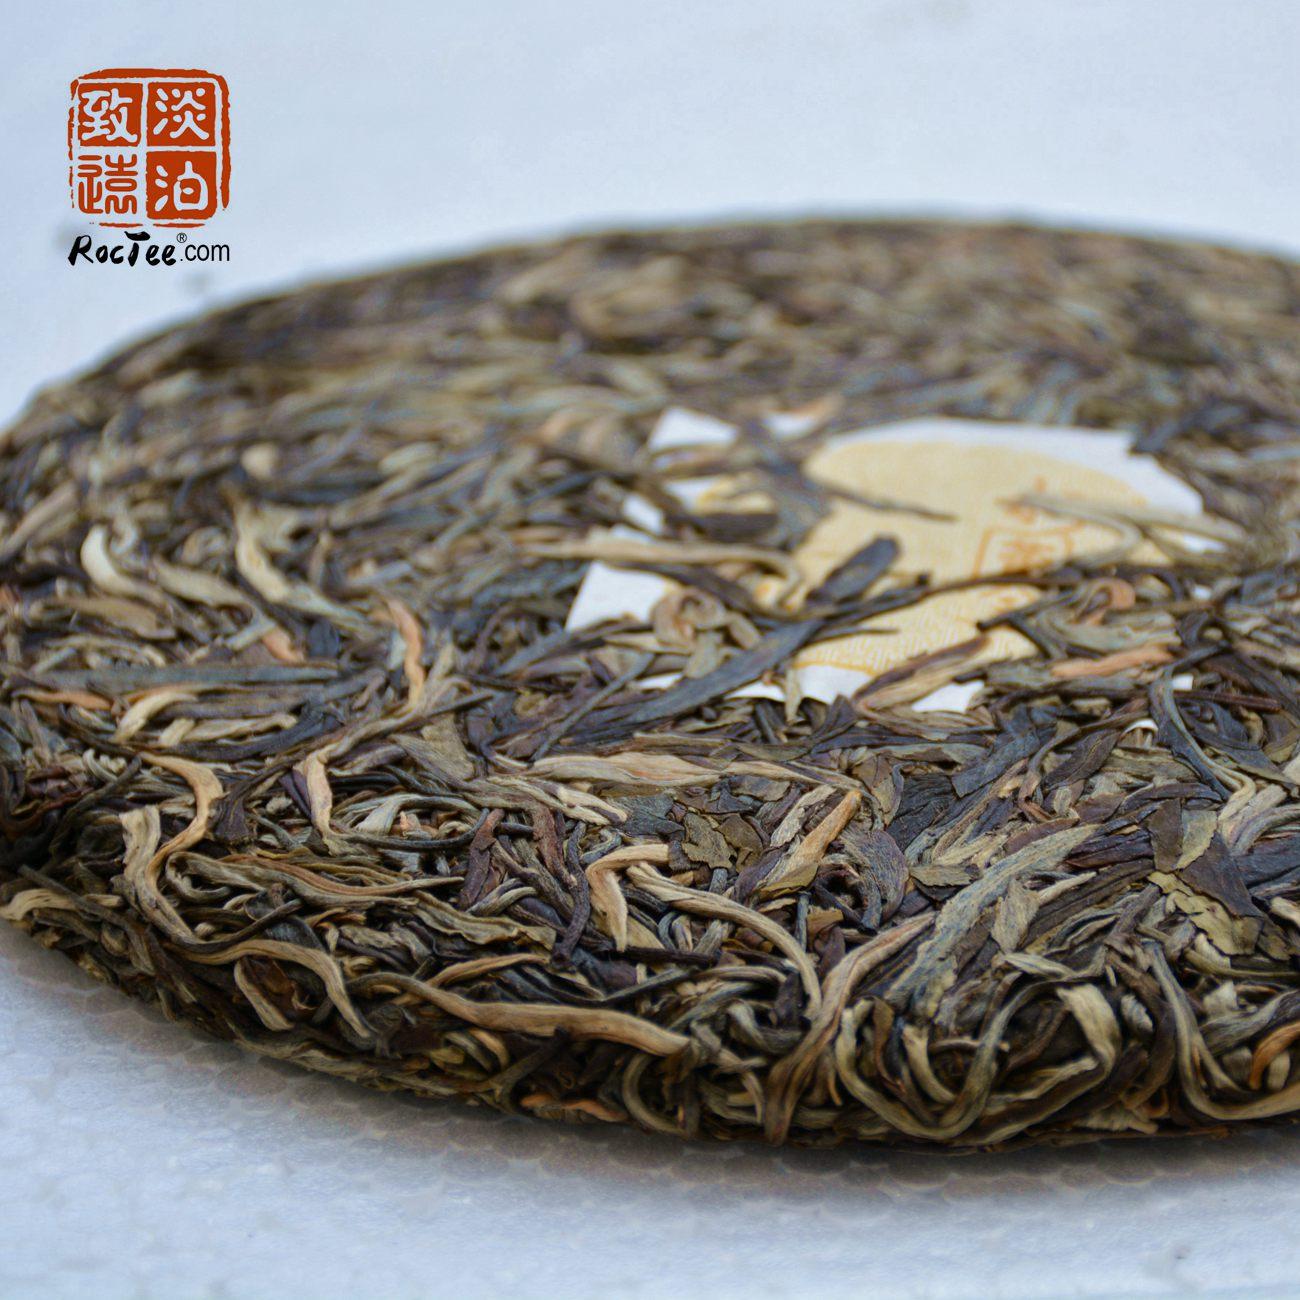 High Quality Shen Puer Tea Chinese Raw Pu er 357g Puerh Te Big Leaves Green Pu